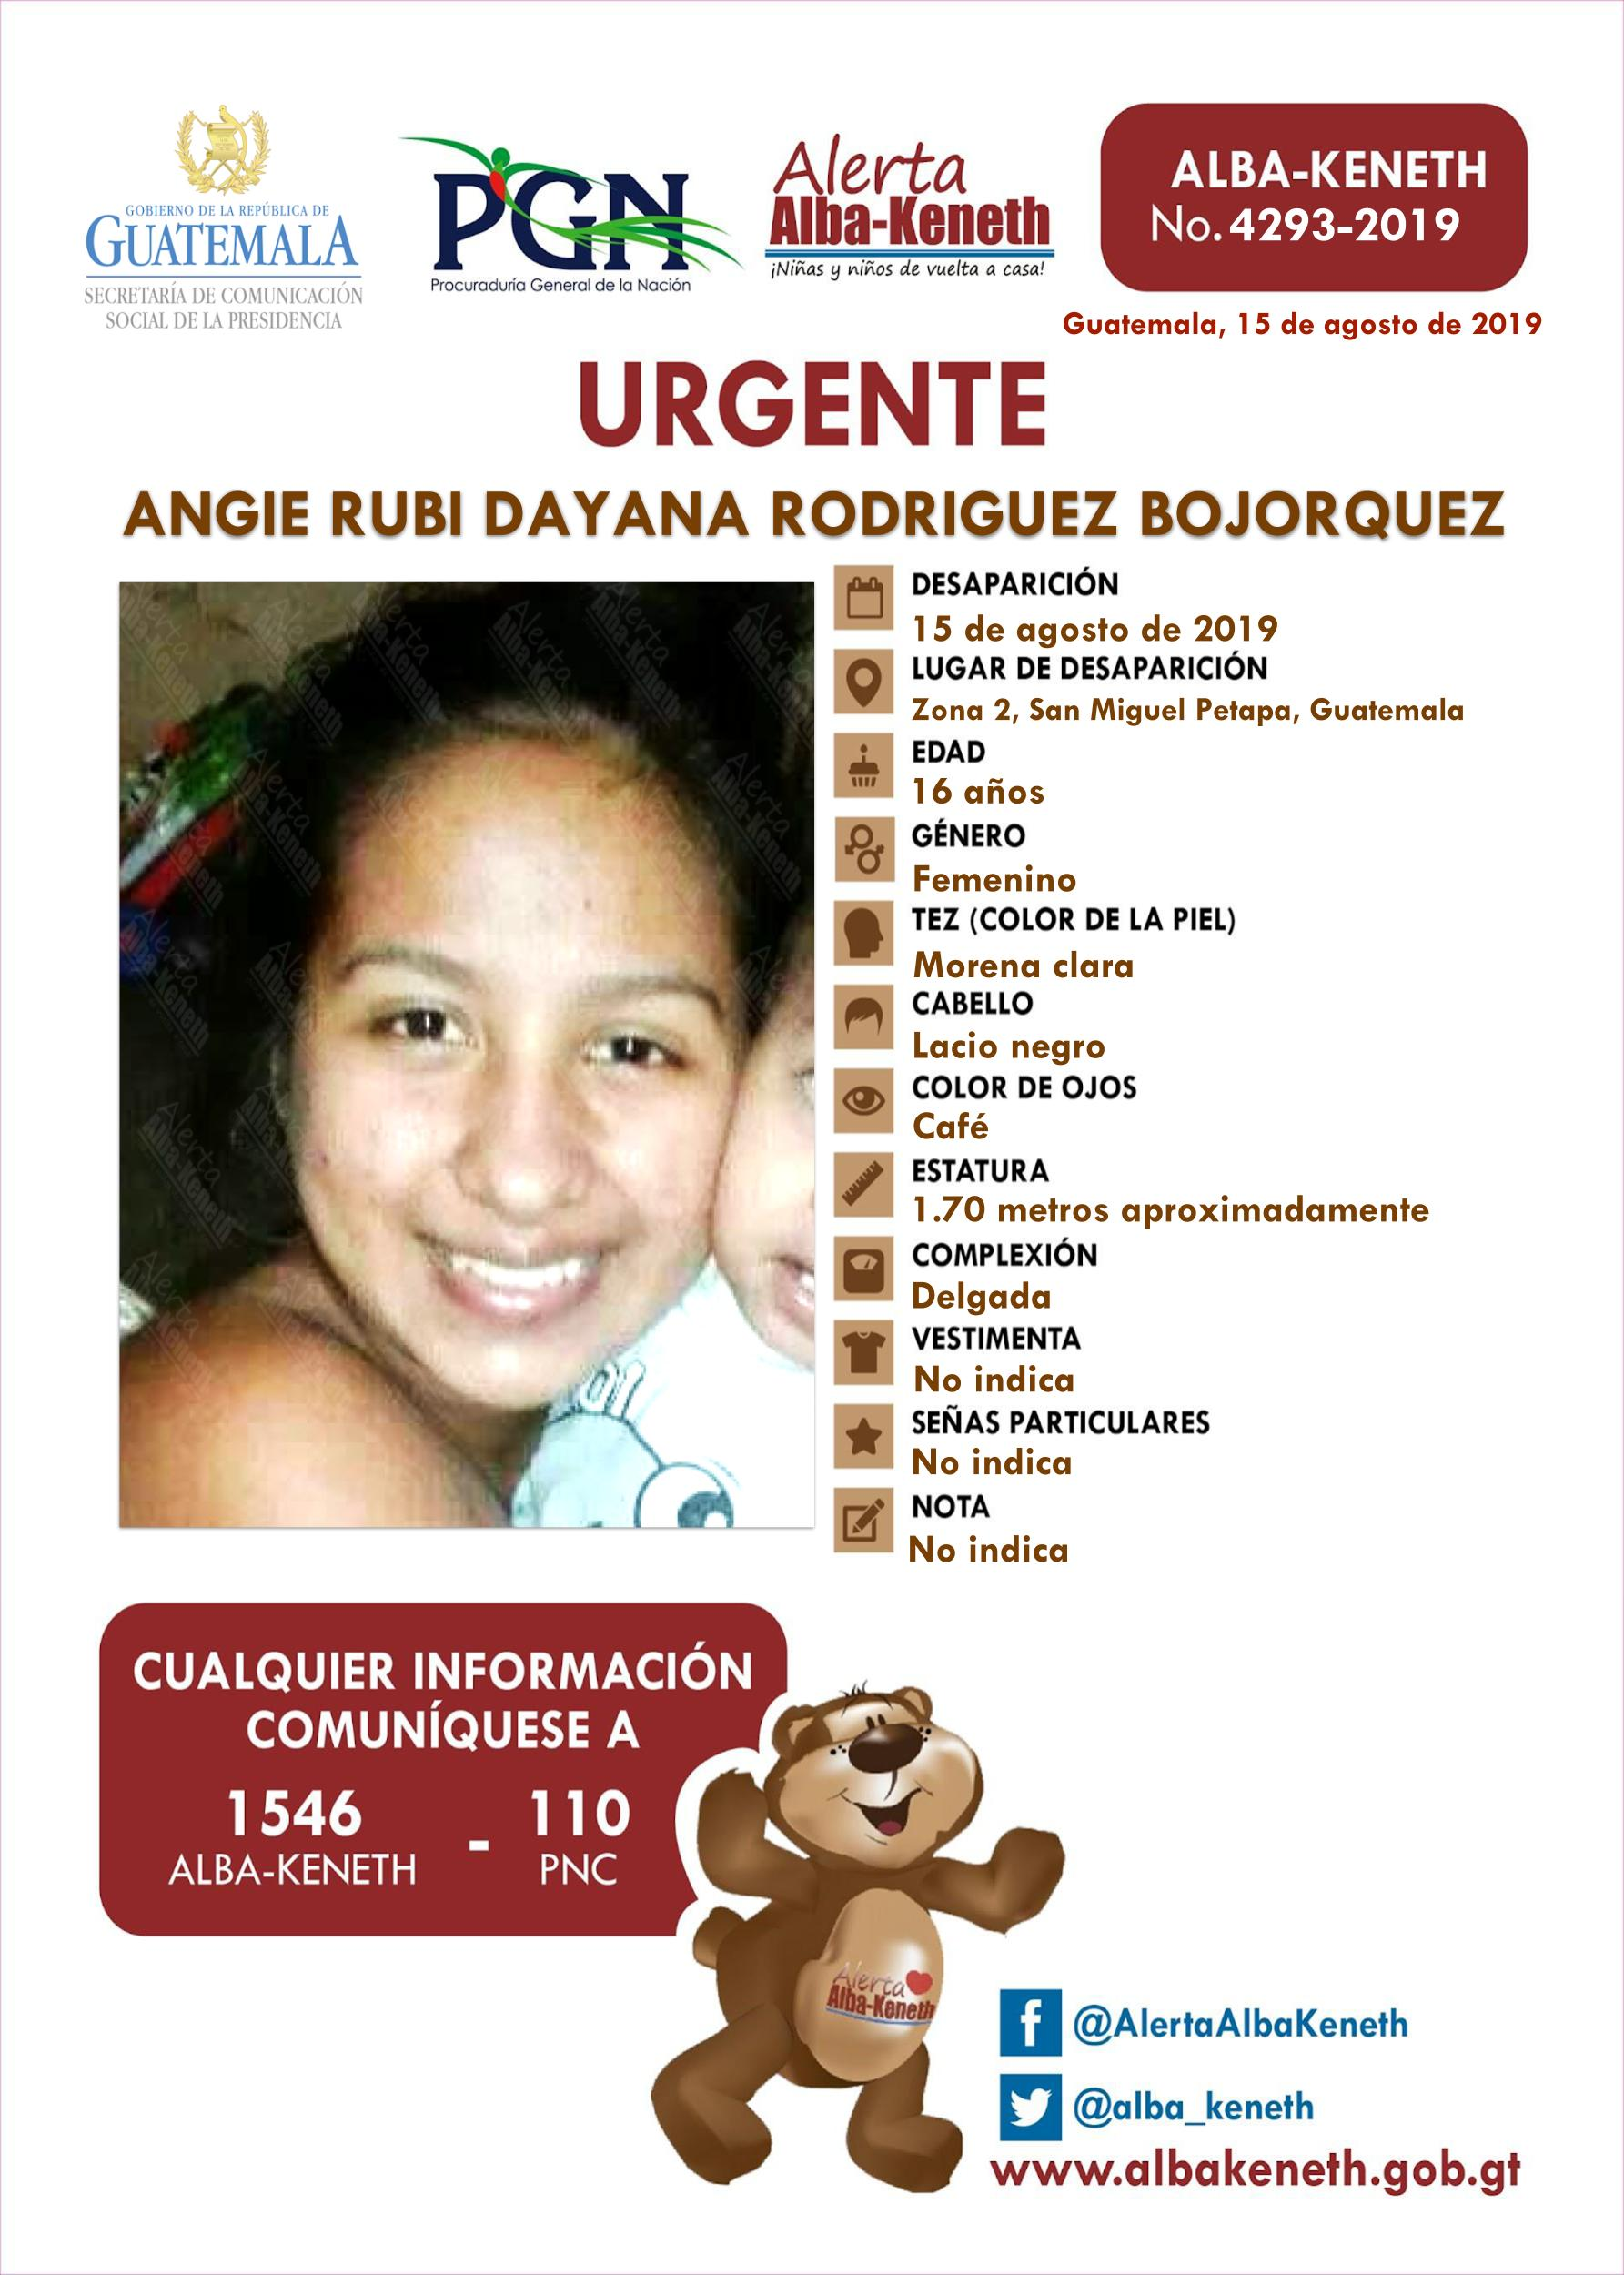 Angie Rubi Dayana Rodriguez Bojorquez